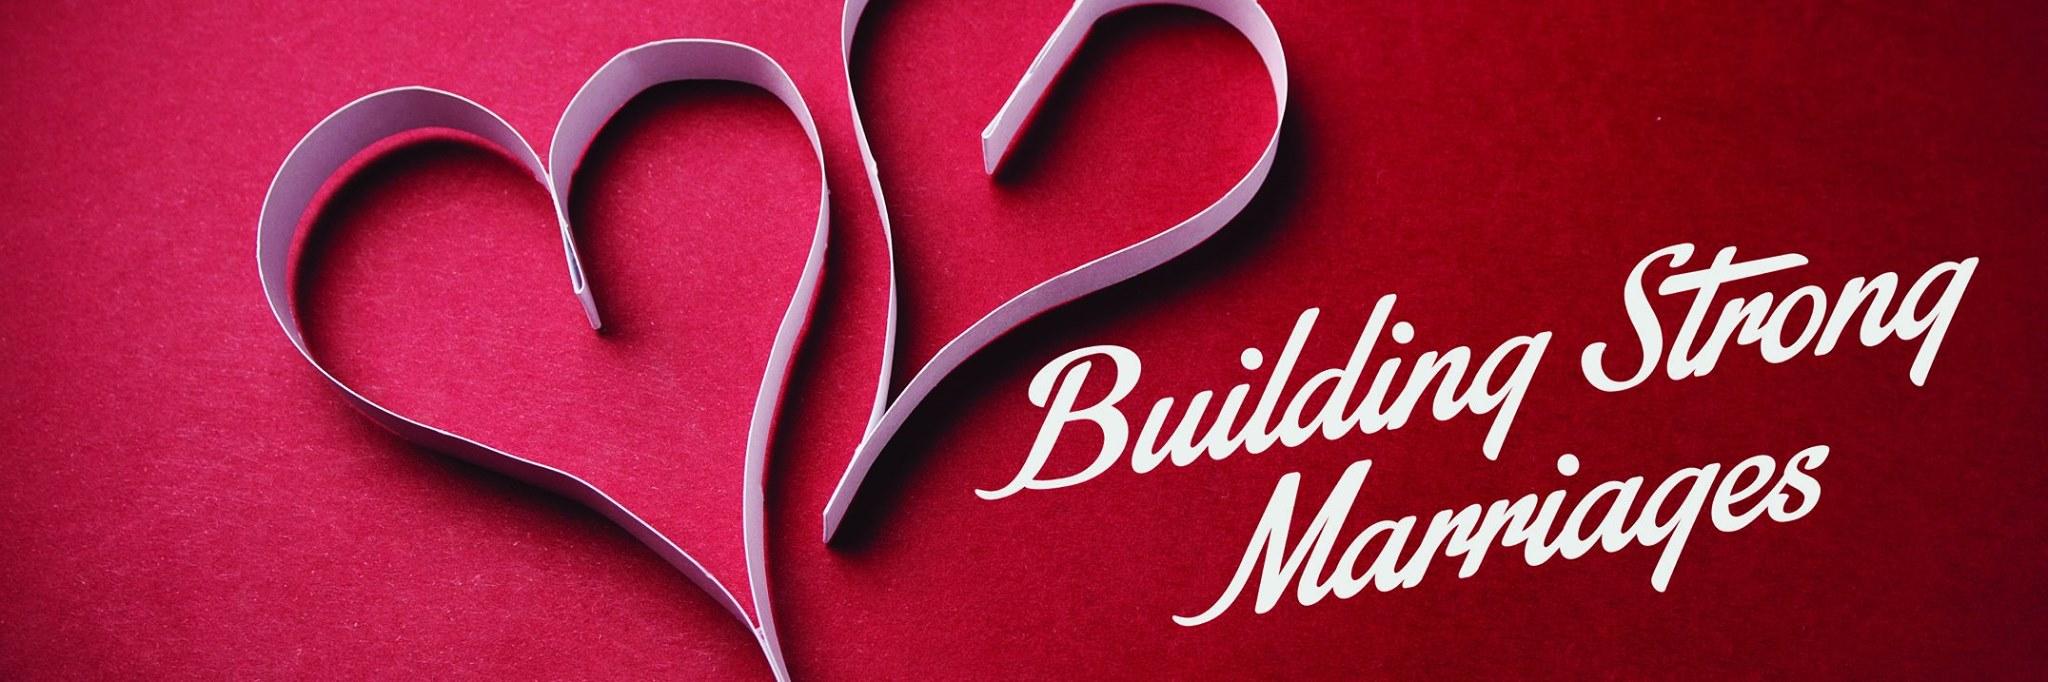 7ecbe79db65001a20e01_2016_Feb_Building_Strong_Marriages.jpg